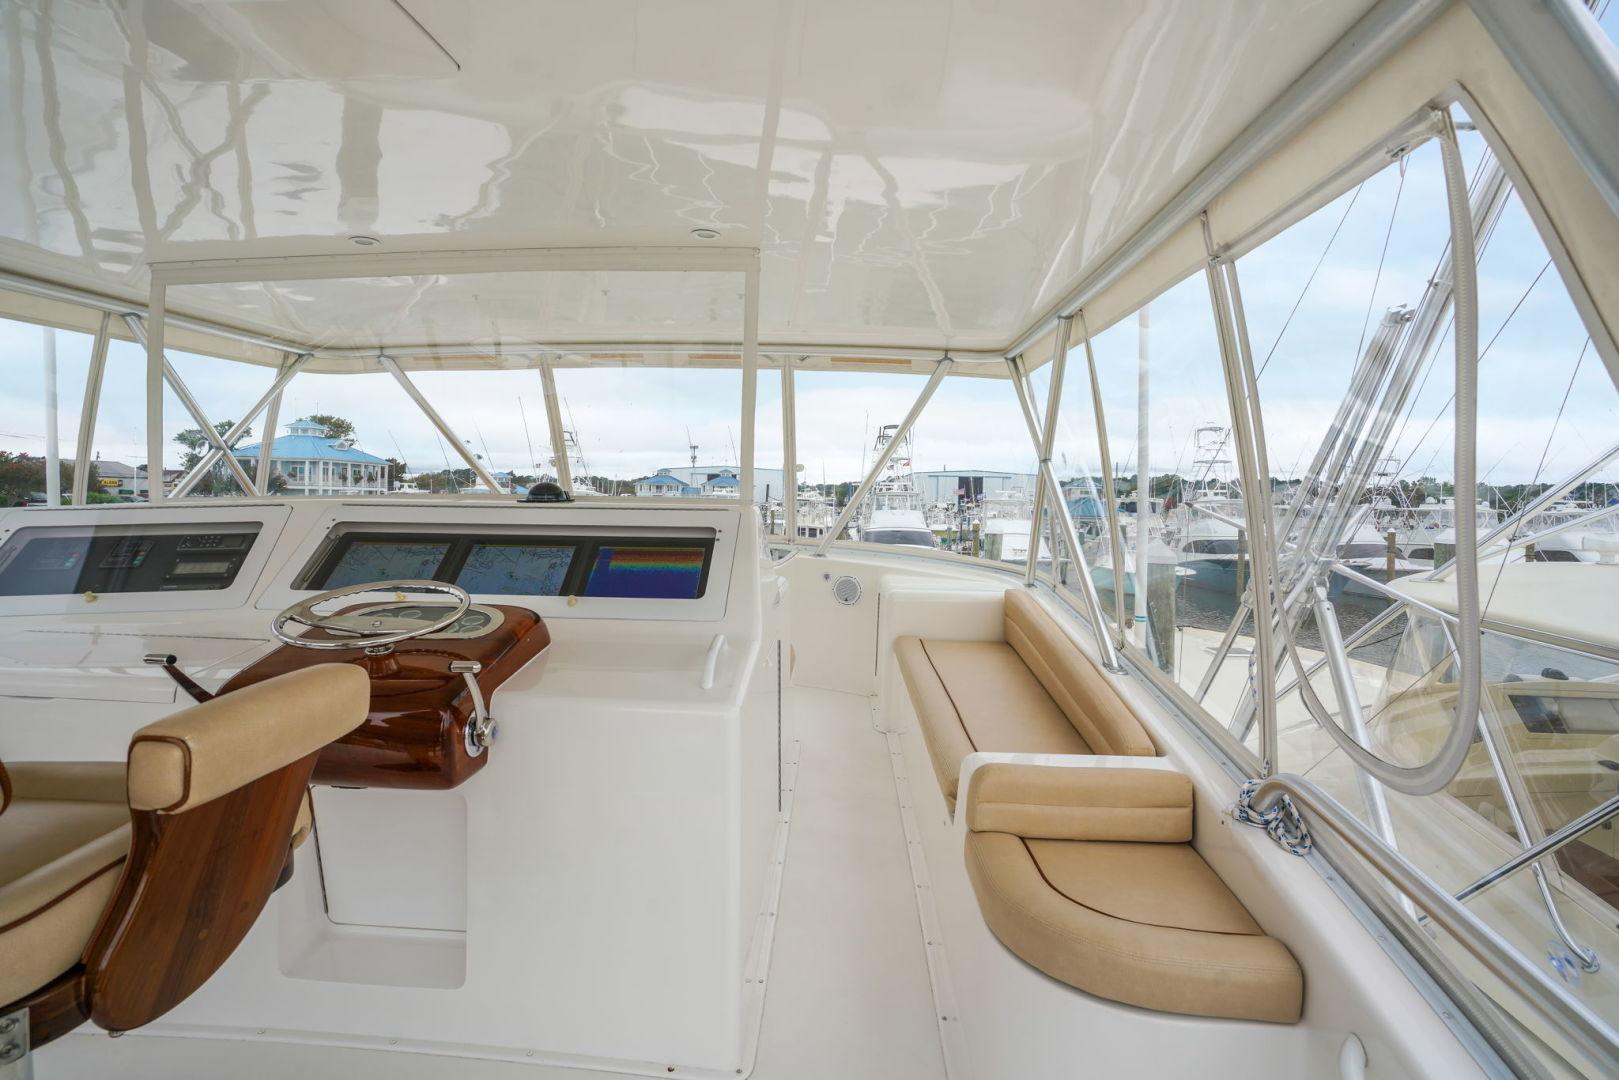 Viking-Convertible 2002-Blue Eyes North Palm Beach-Florida-United States-Flybridge-1490374   Thumbnail